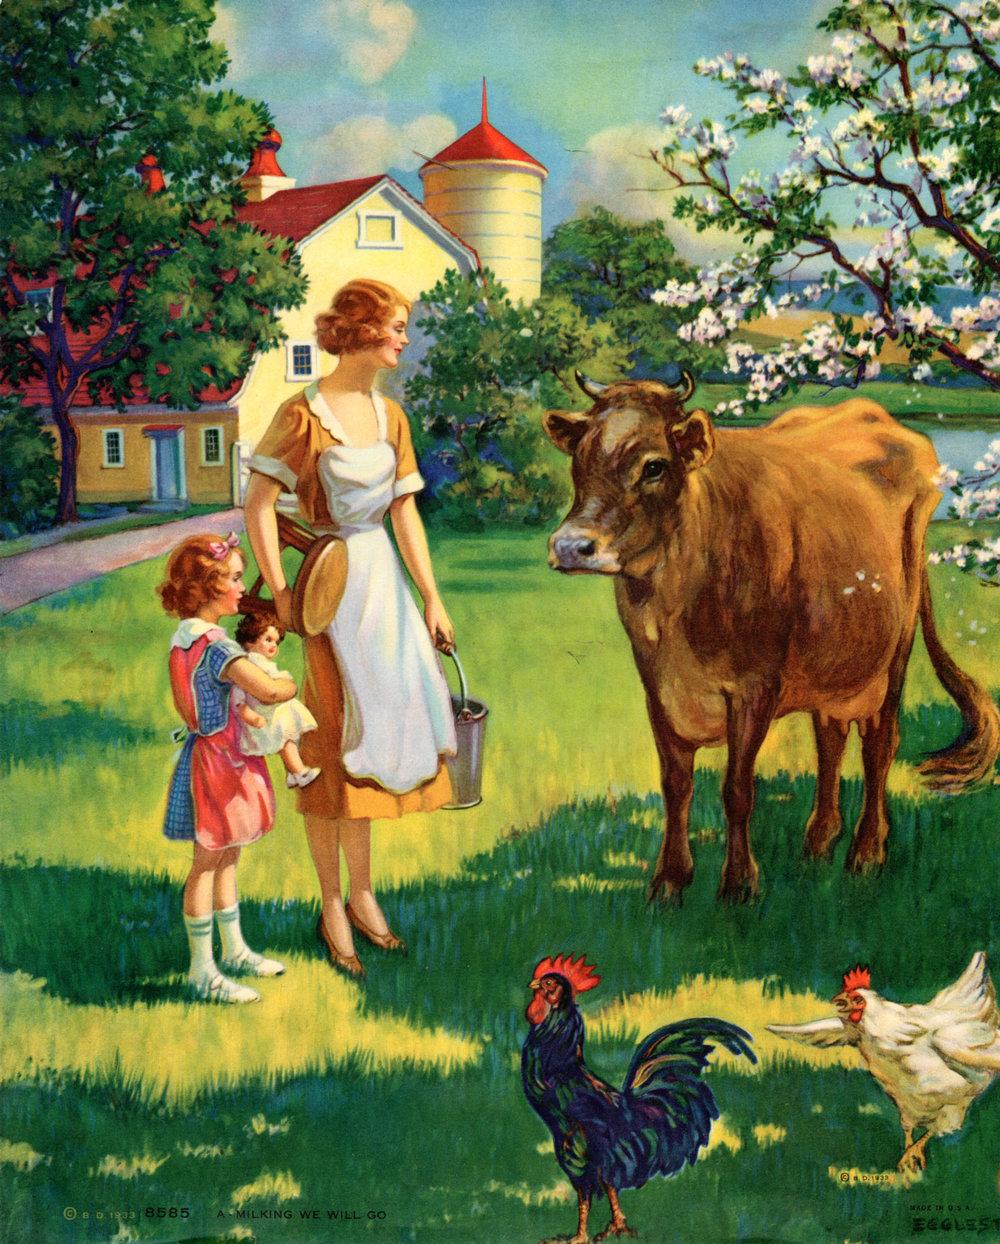 Cows, Livestock, Farm life, etc.